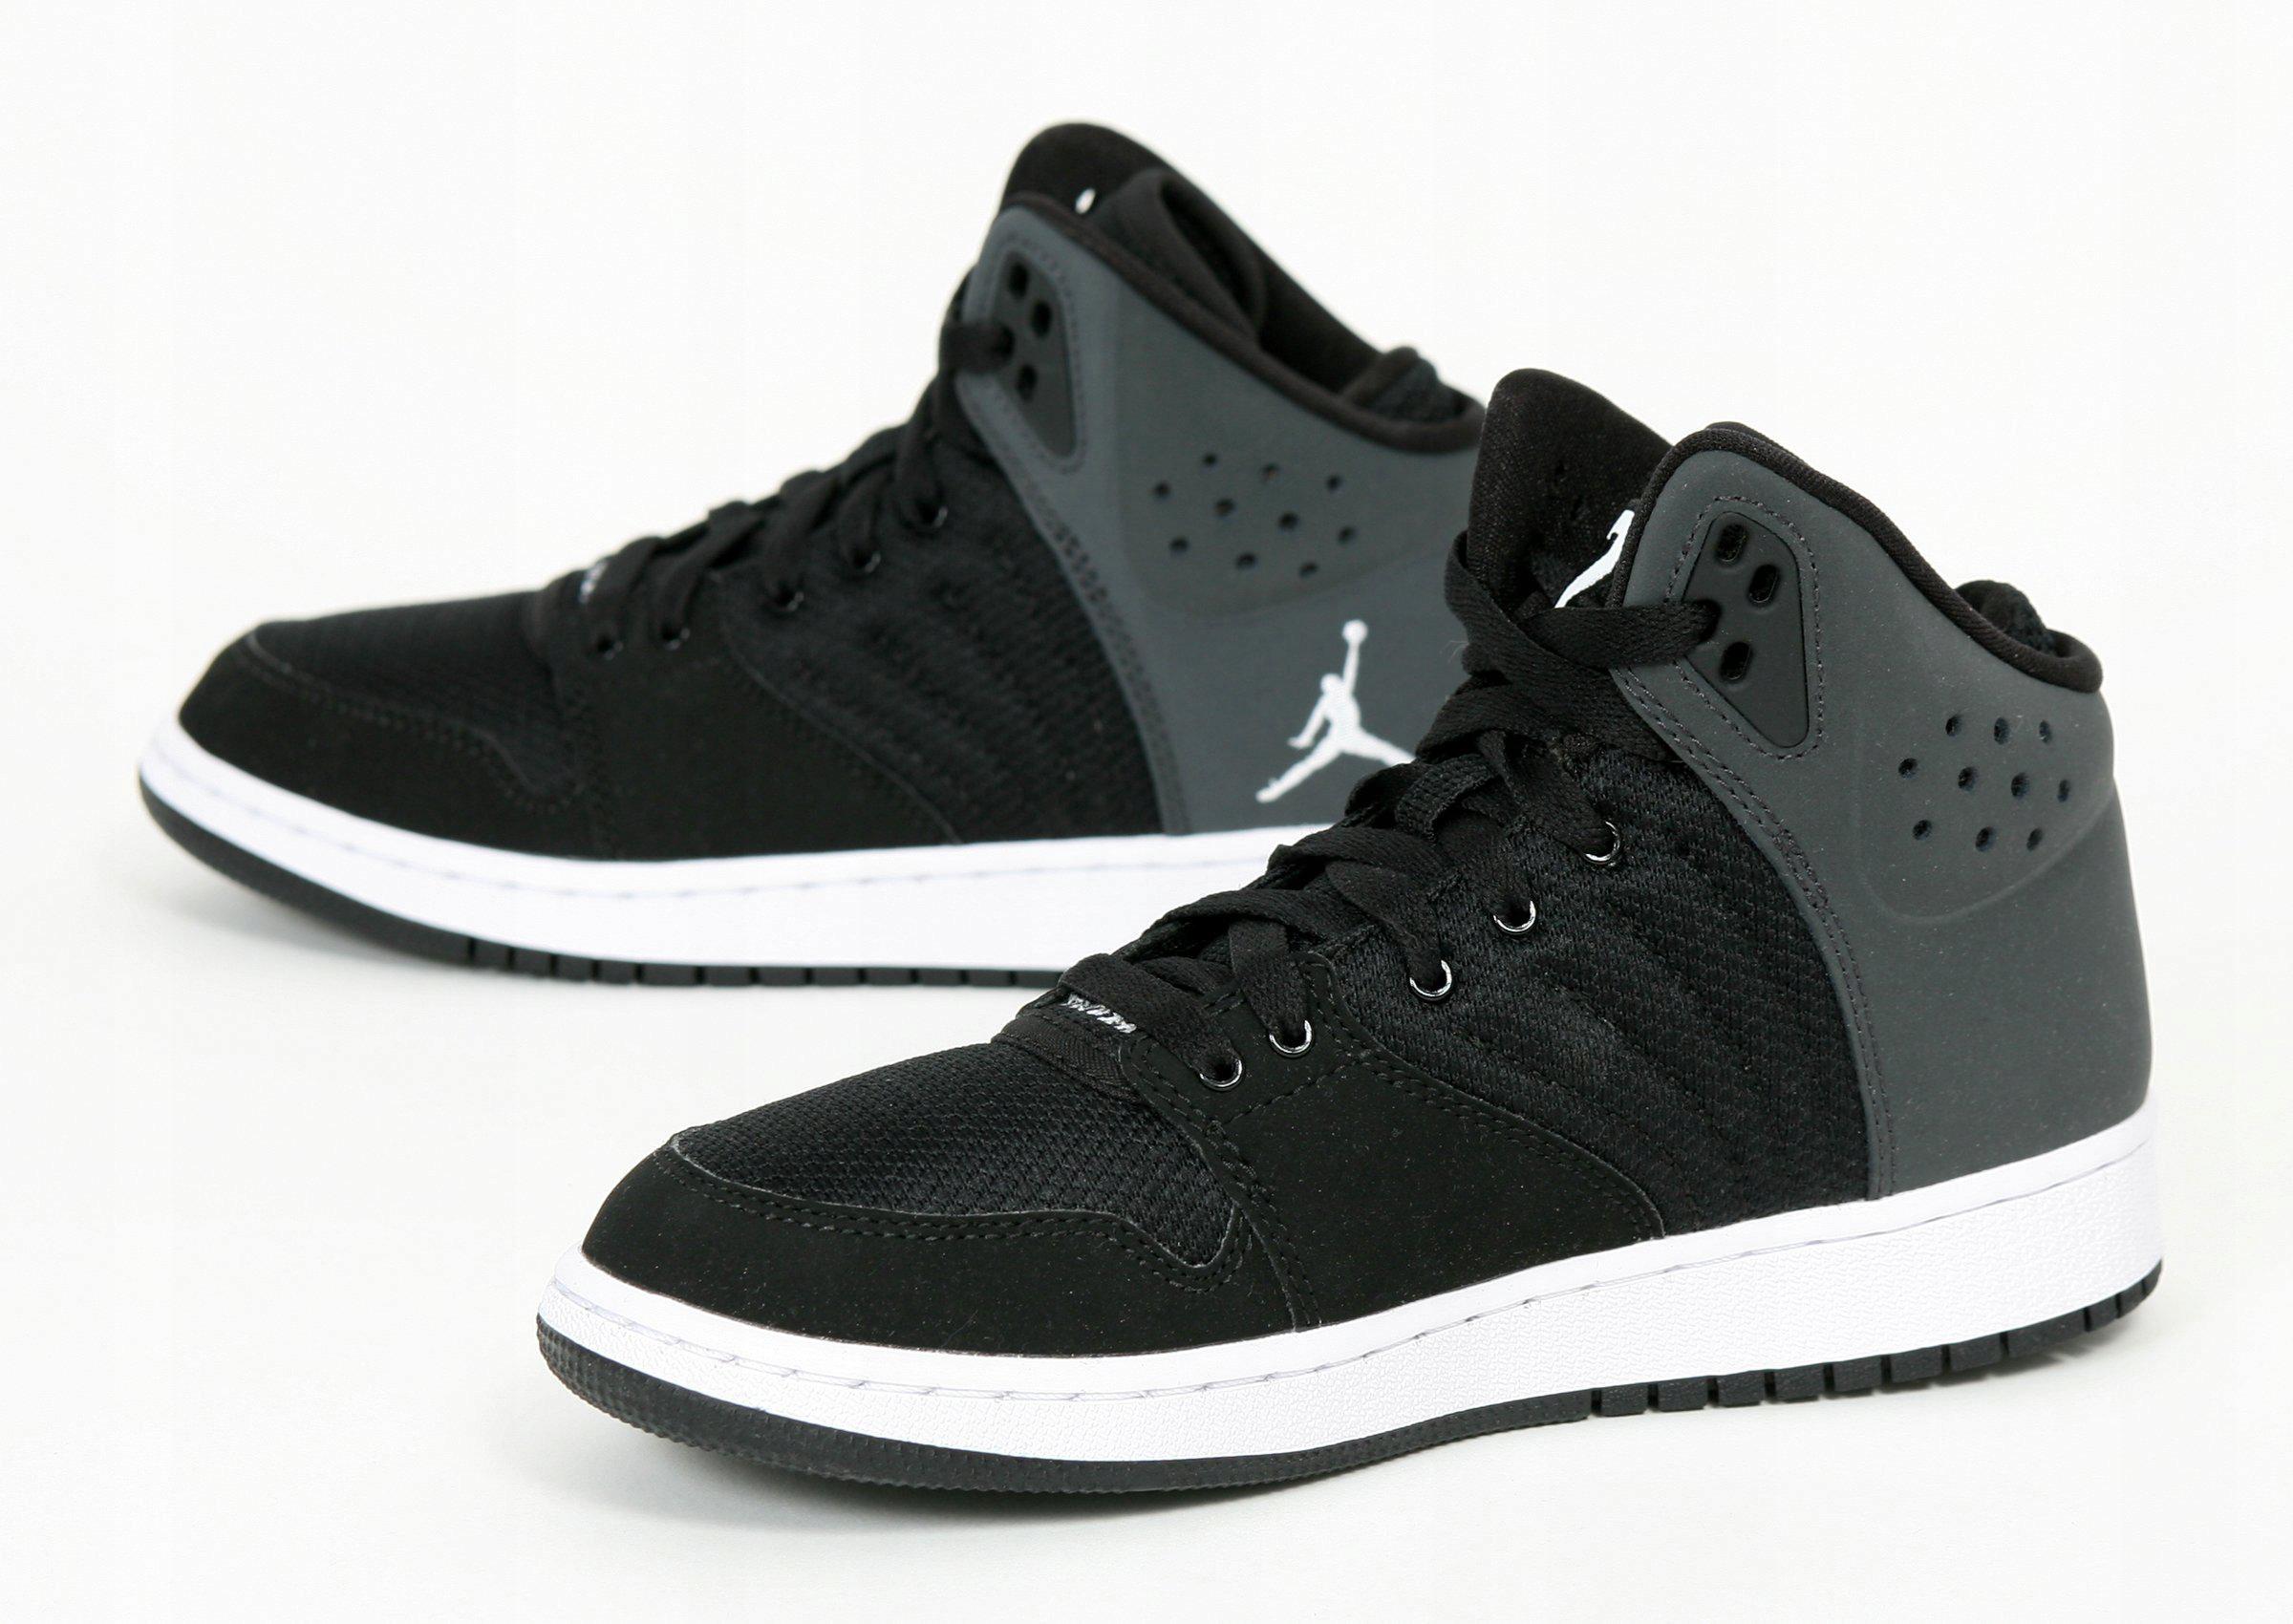 100% authentic 0b998 b8eac Buty męskie Nike Jordan 1 Flight 4 PREMIUM Bg ... (7679091818)